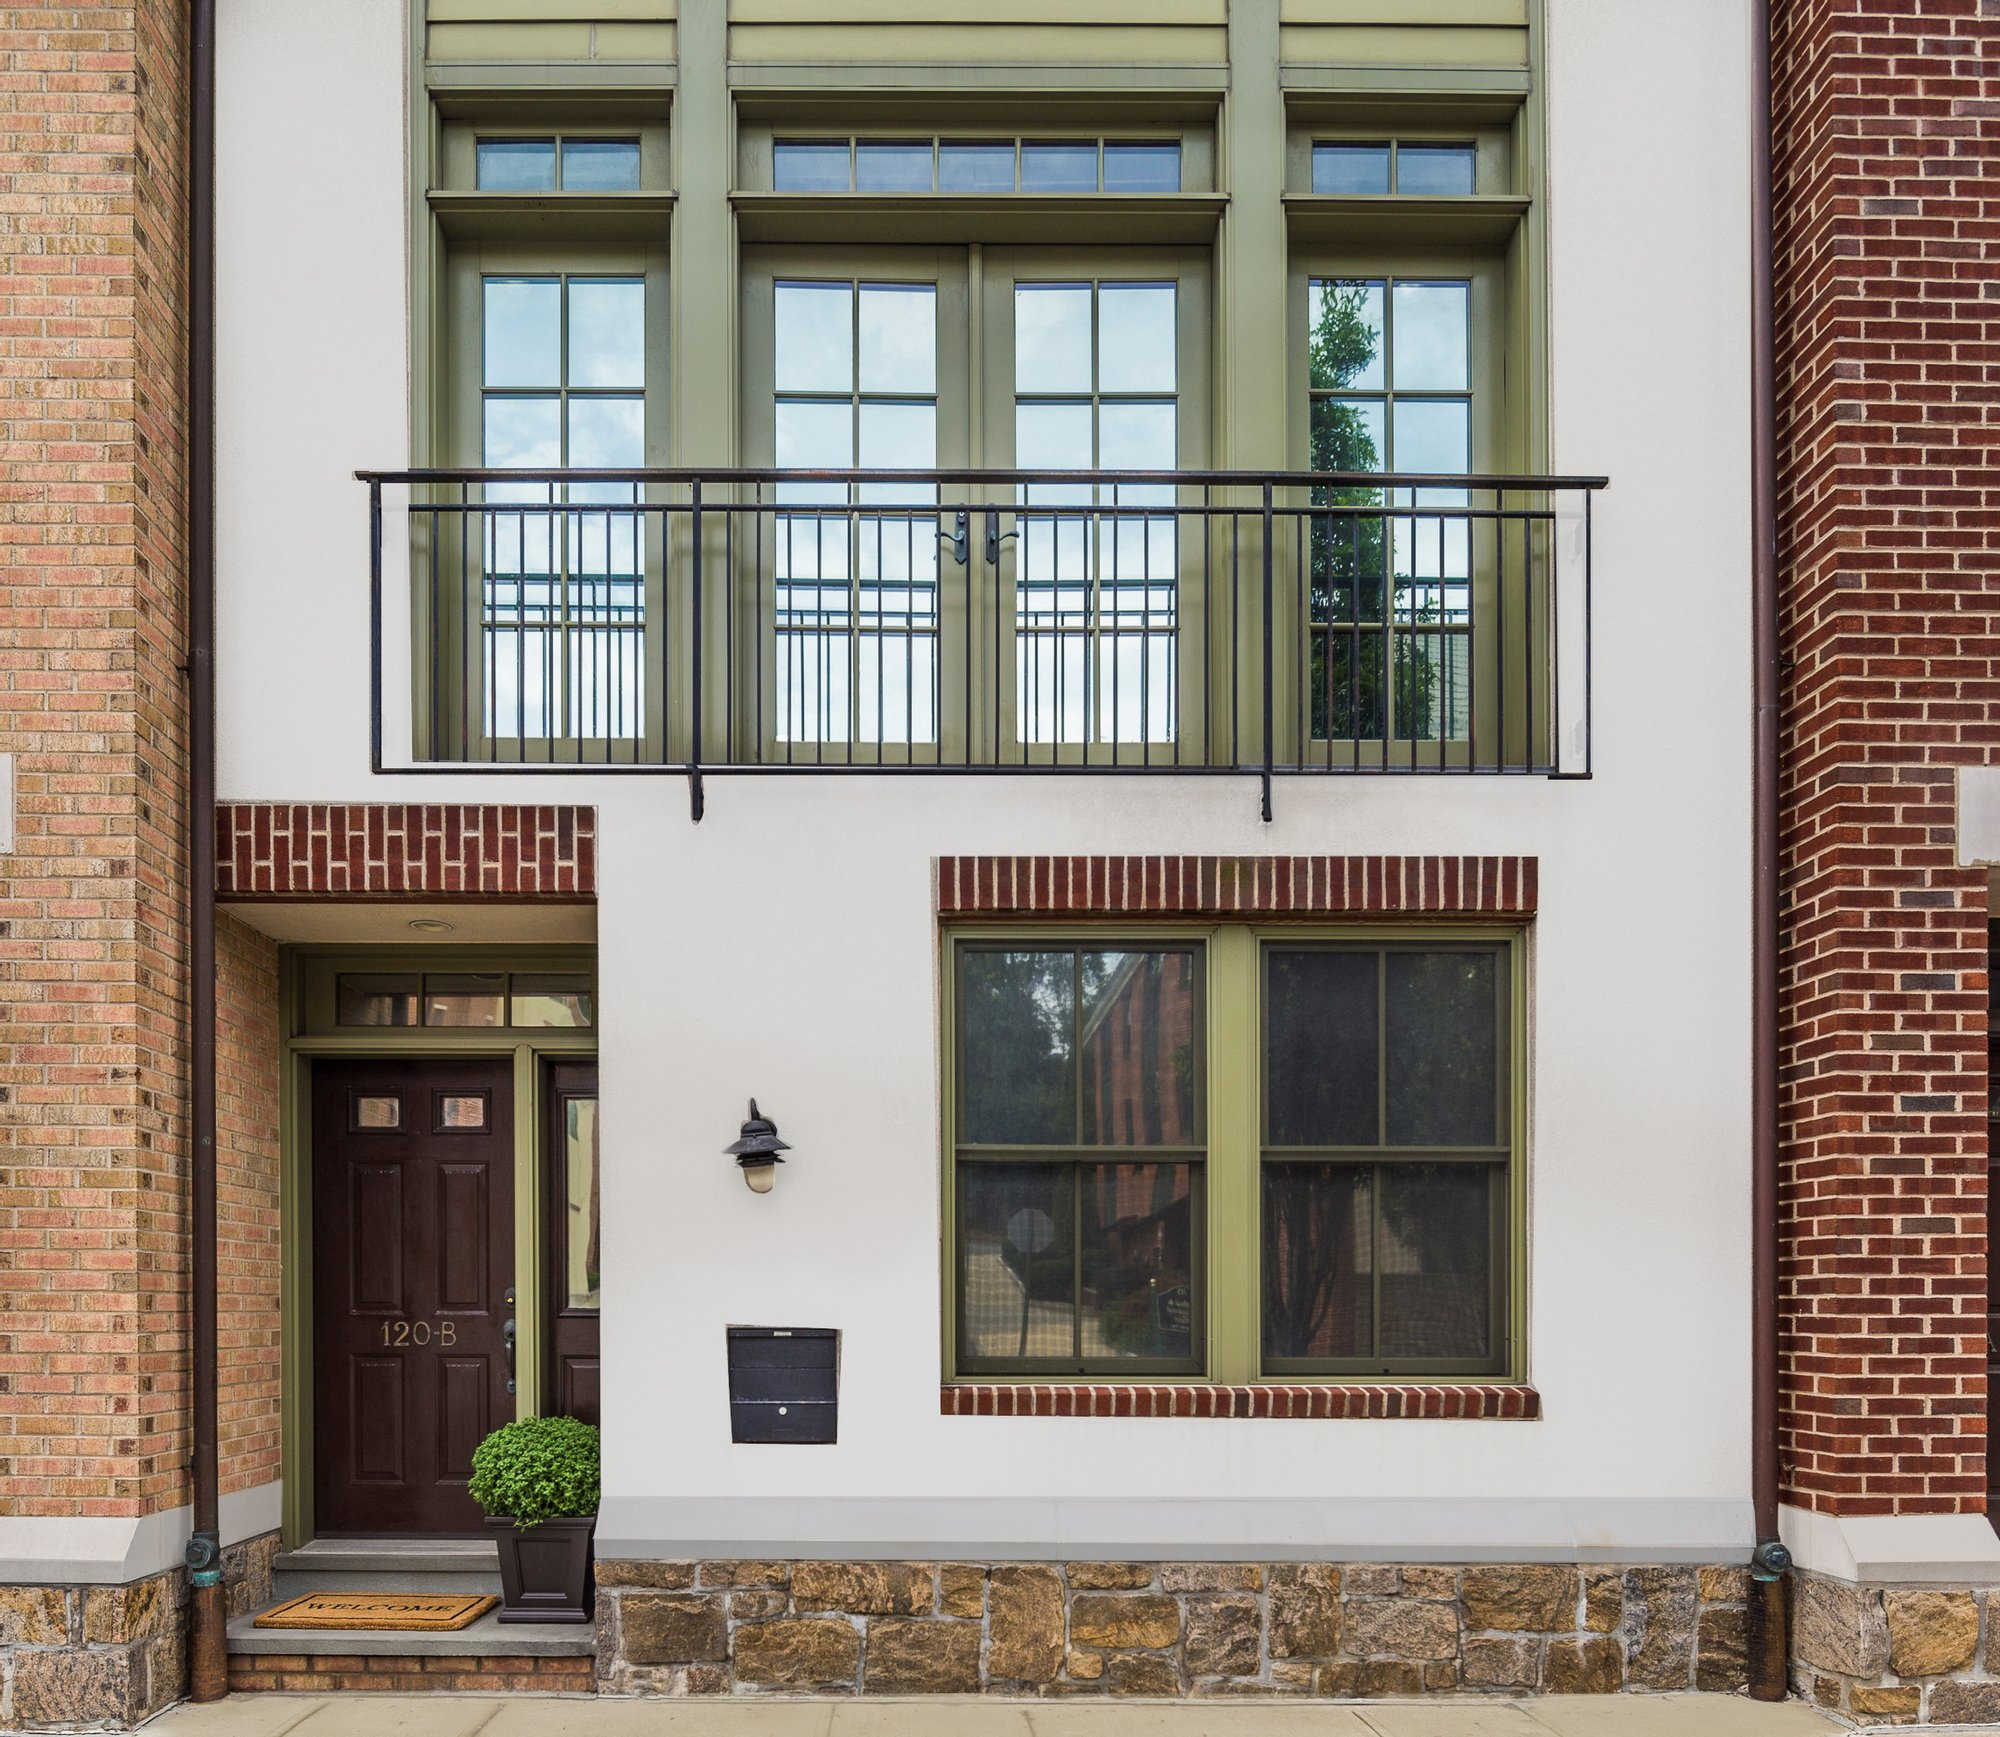 Condo in Tuckahoe, New York, United States 1